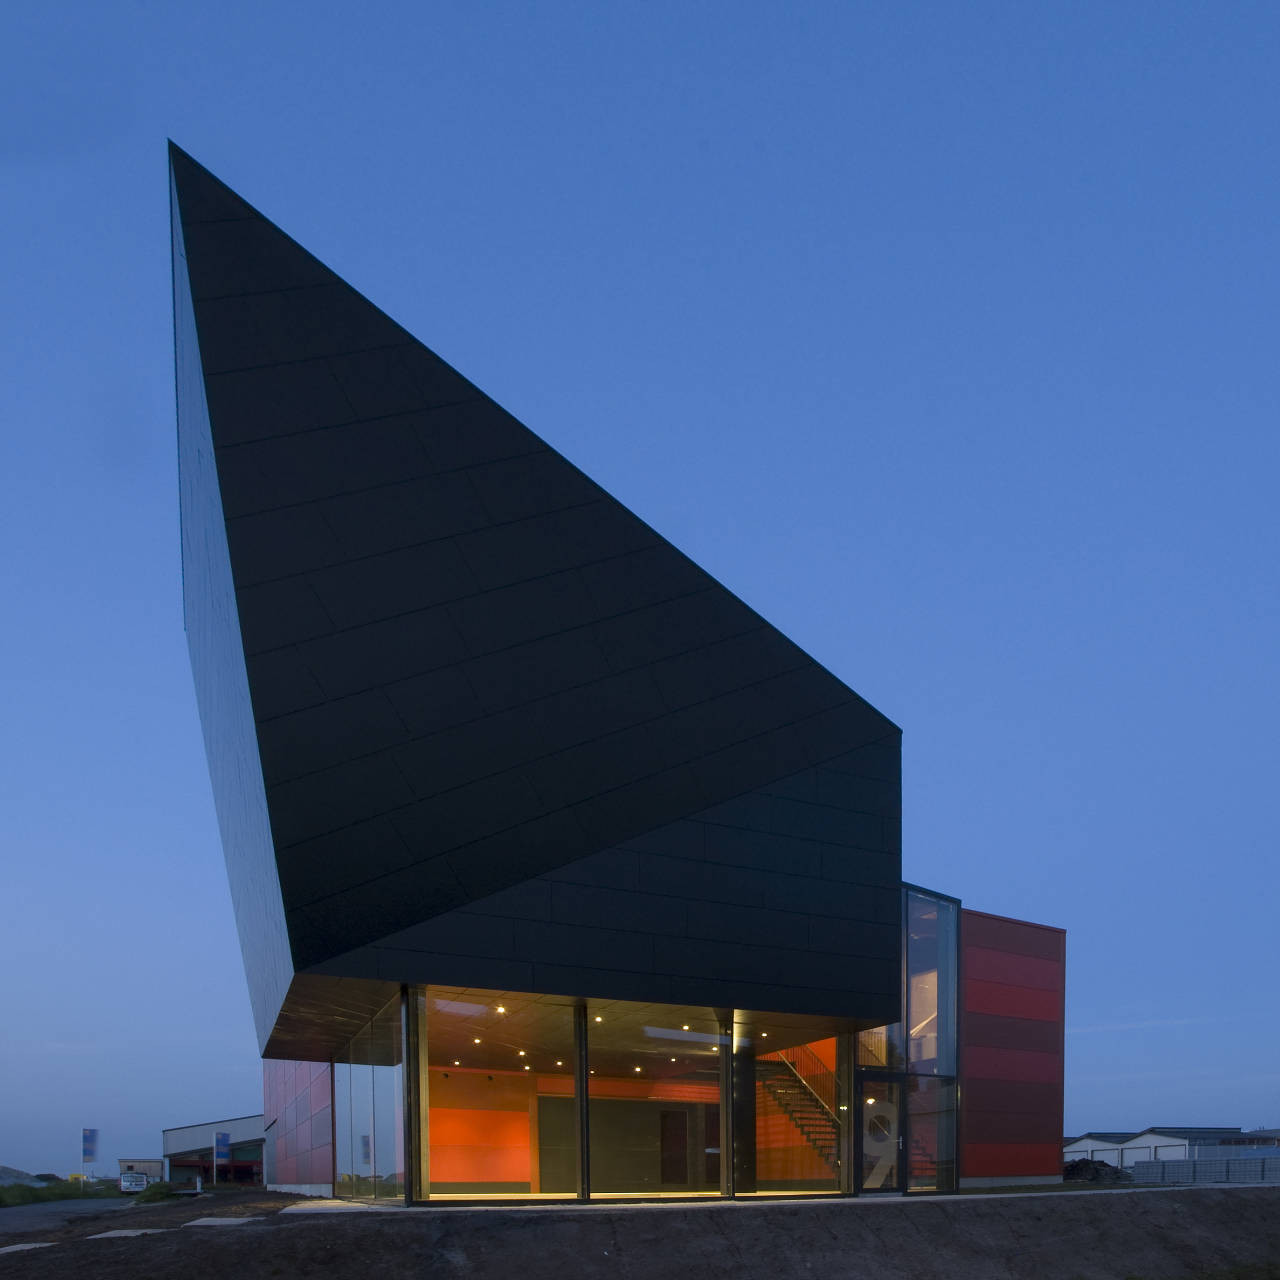 Electric Boat House in The Netherlands / Sebastiaan Jansen Architectuur, © Sebastiaan Jansen